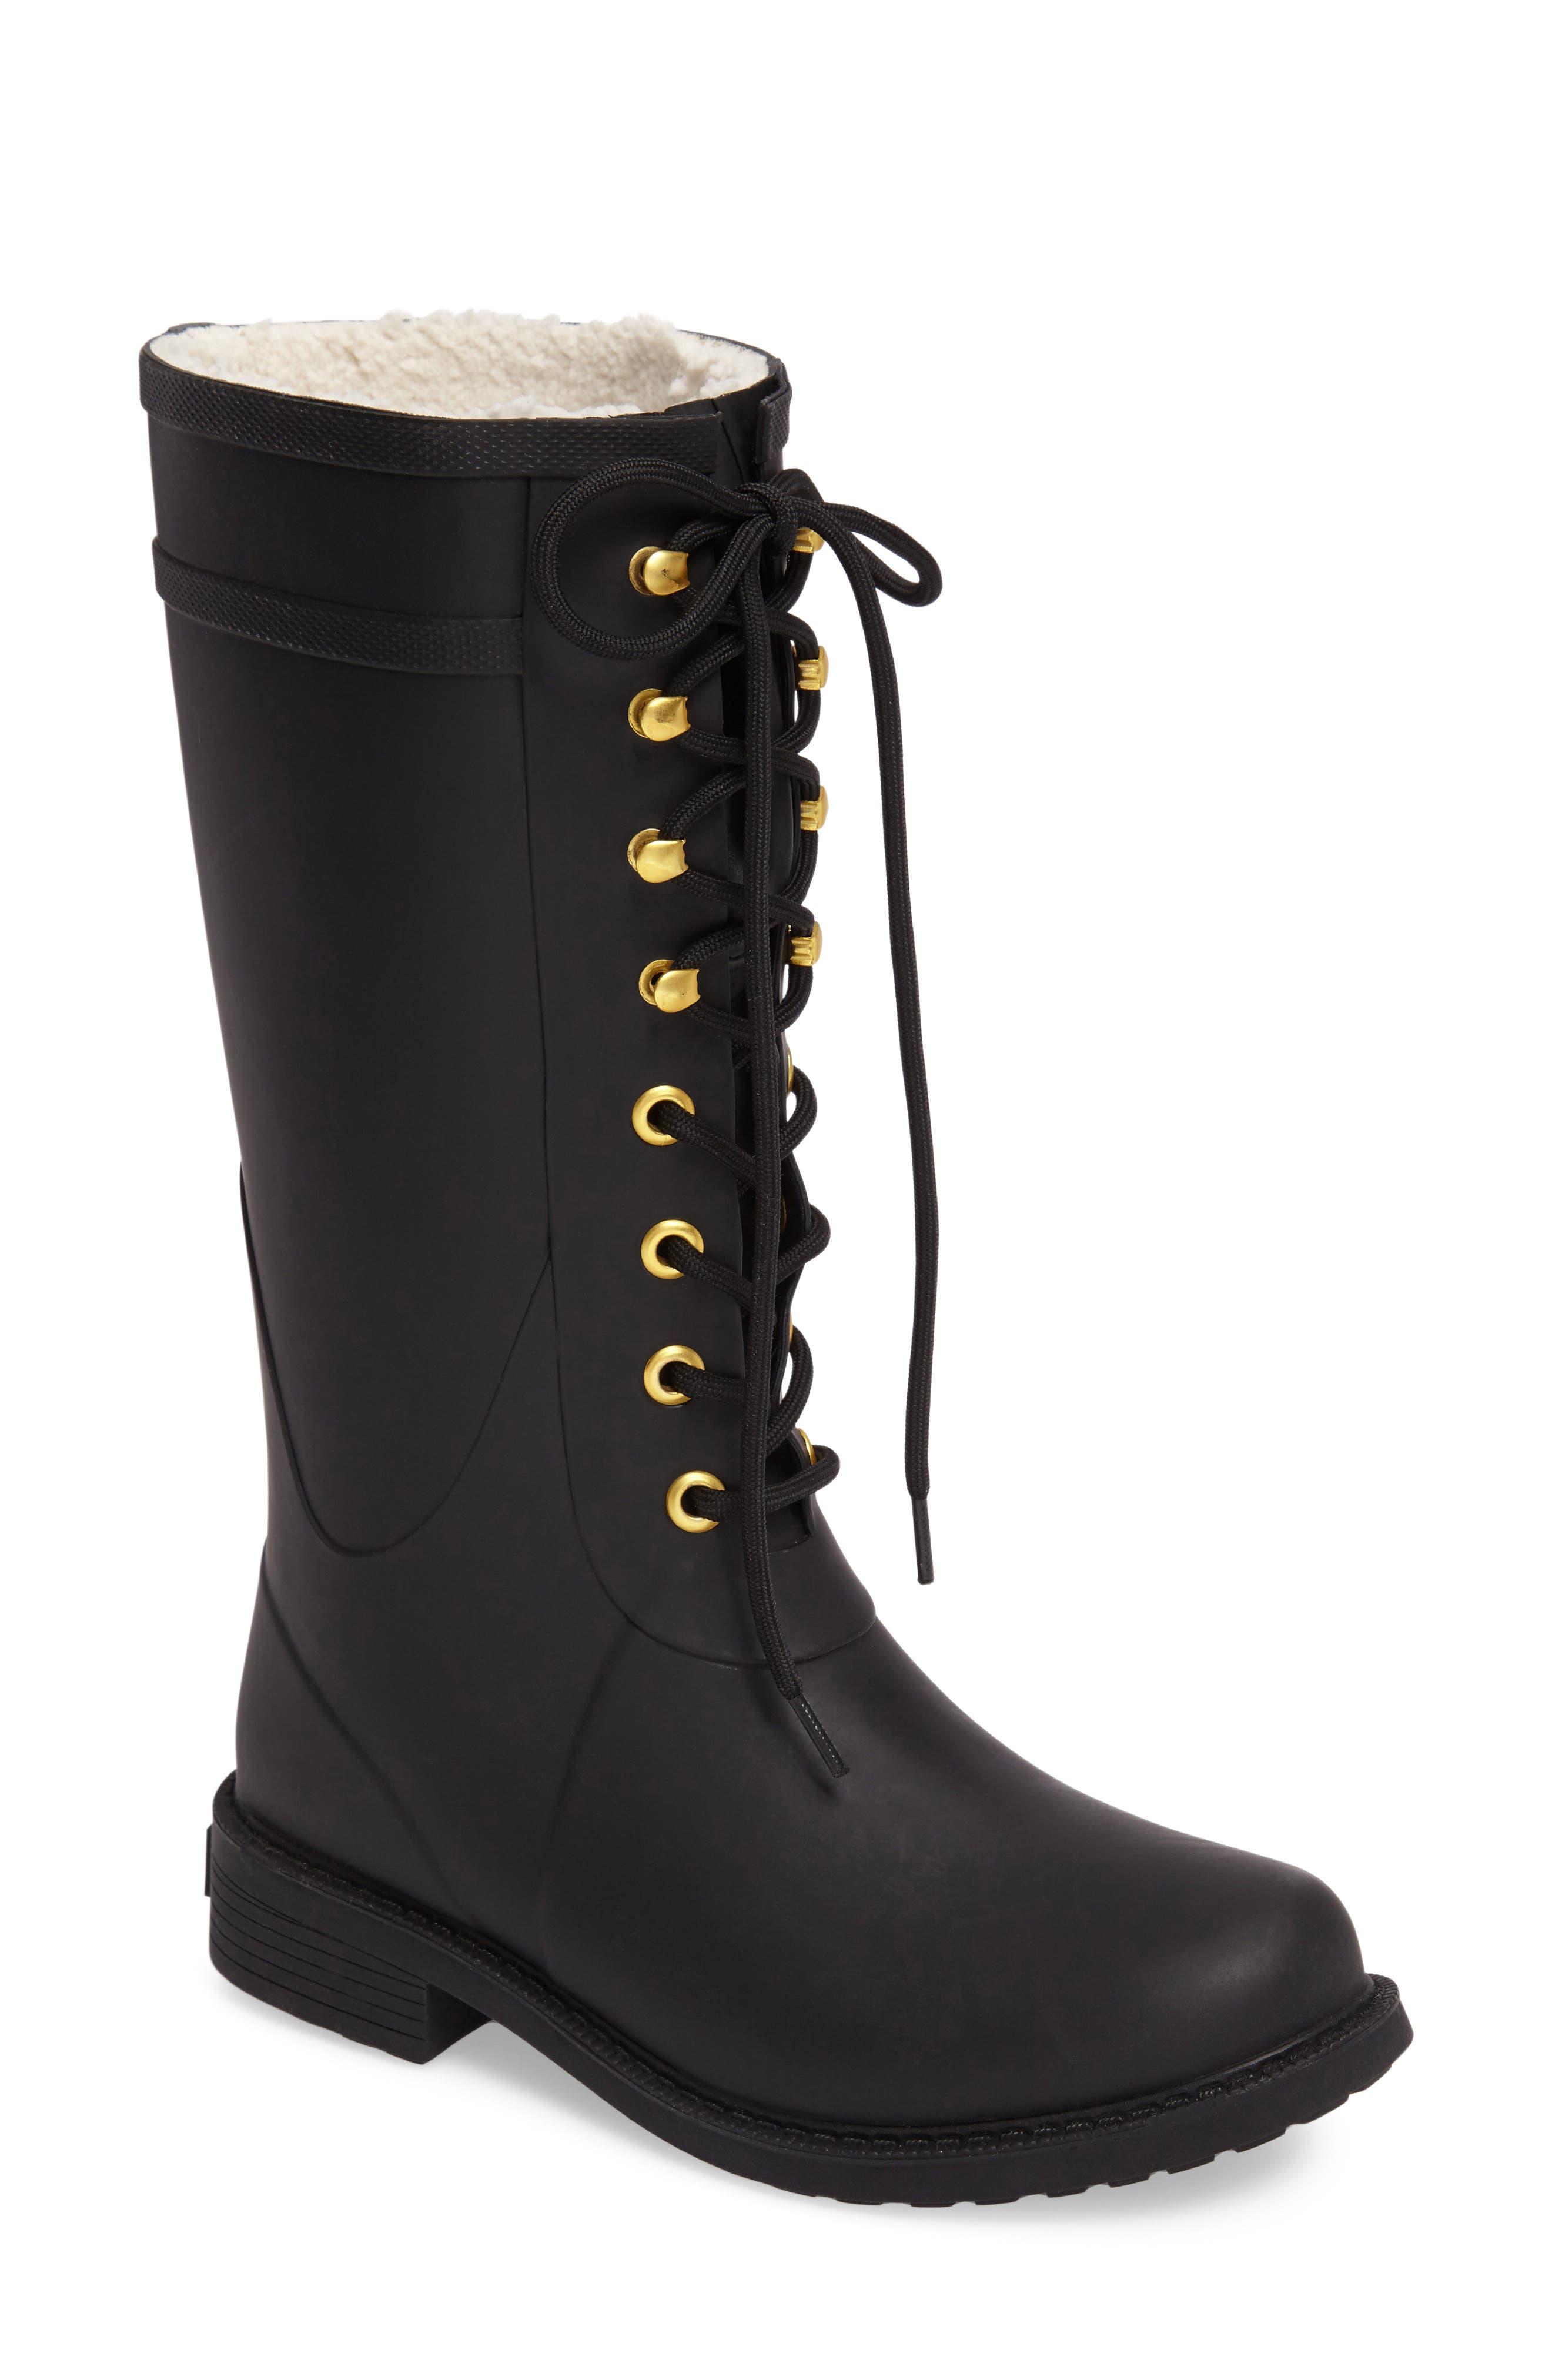 Main Image - Sam Edelman Kay Lace-Up Rain Boot (Women)